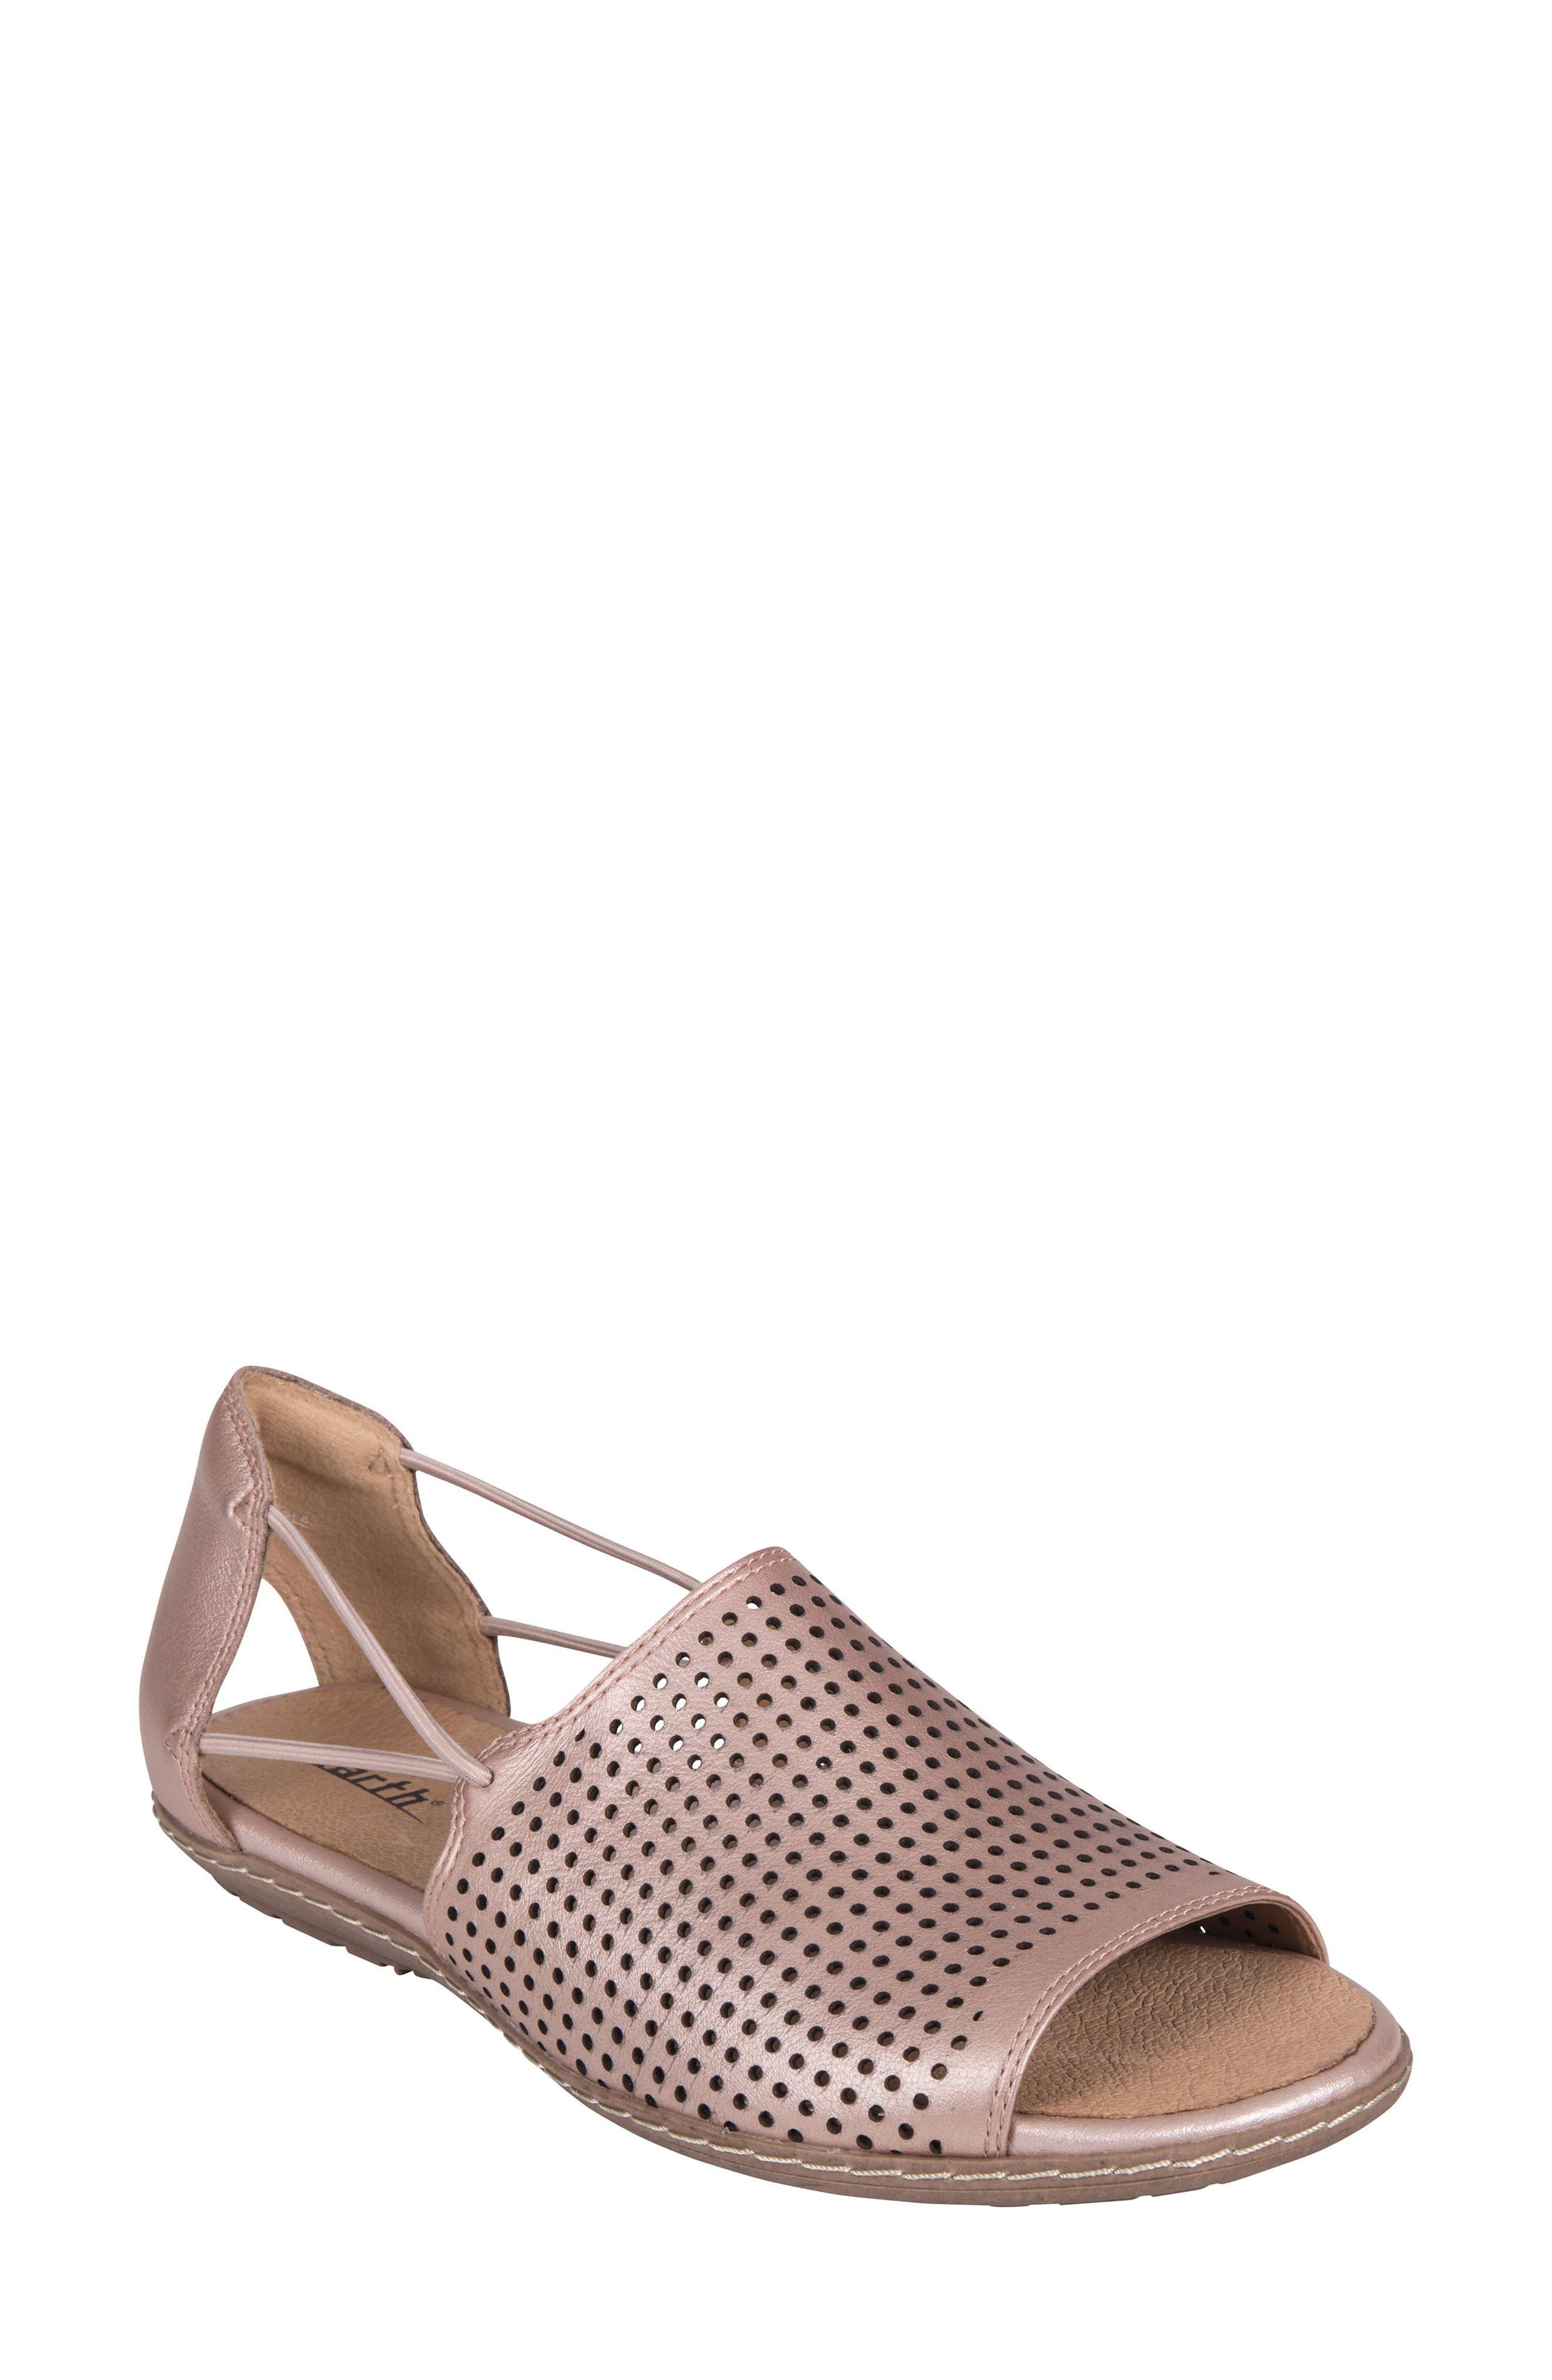 Shelly Sandal,                         Main,                         color, Blush Metallic Leather